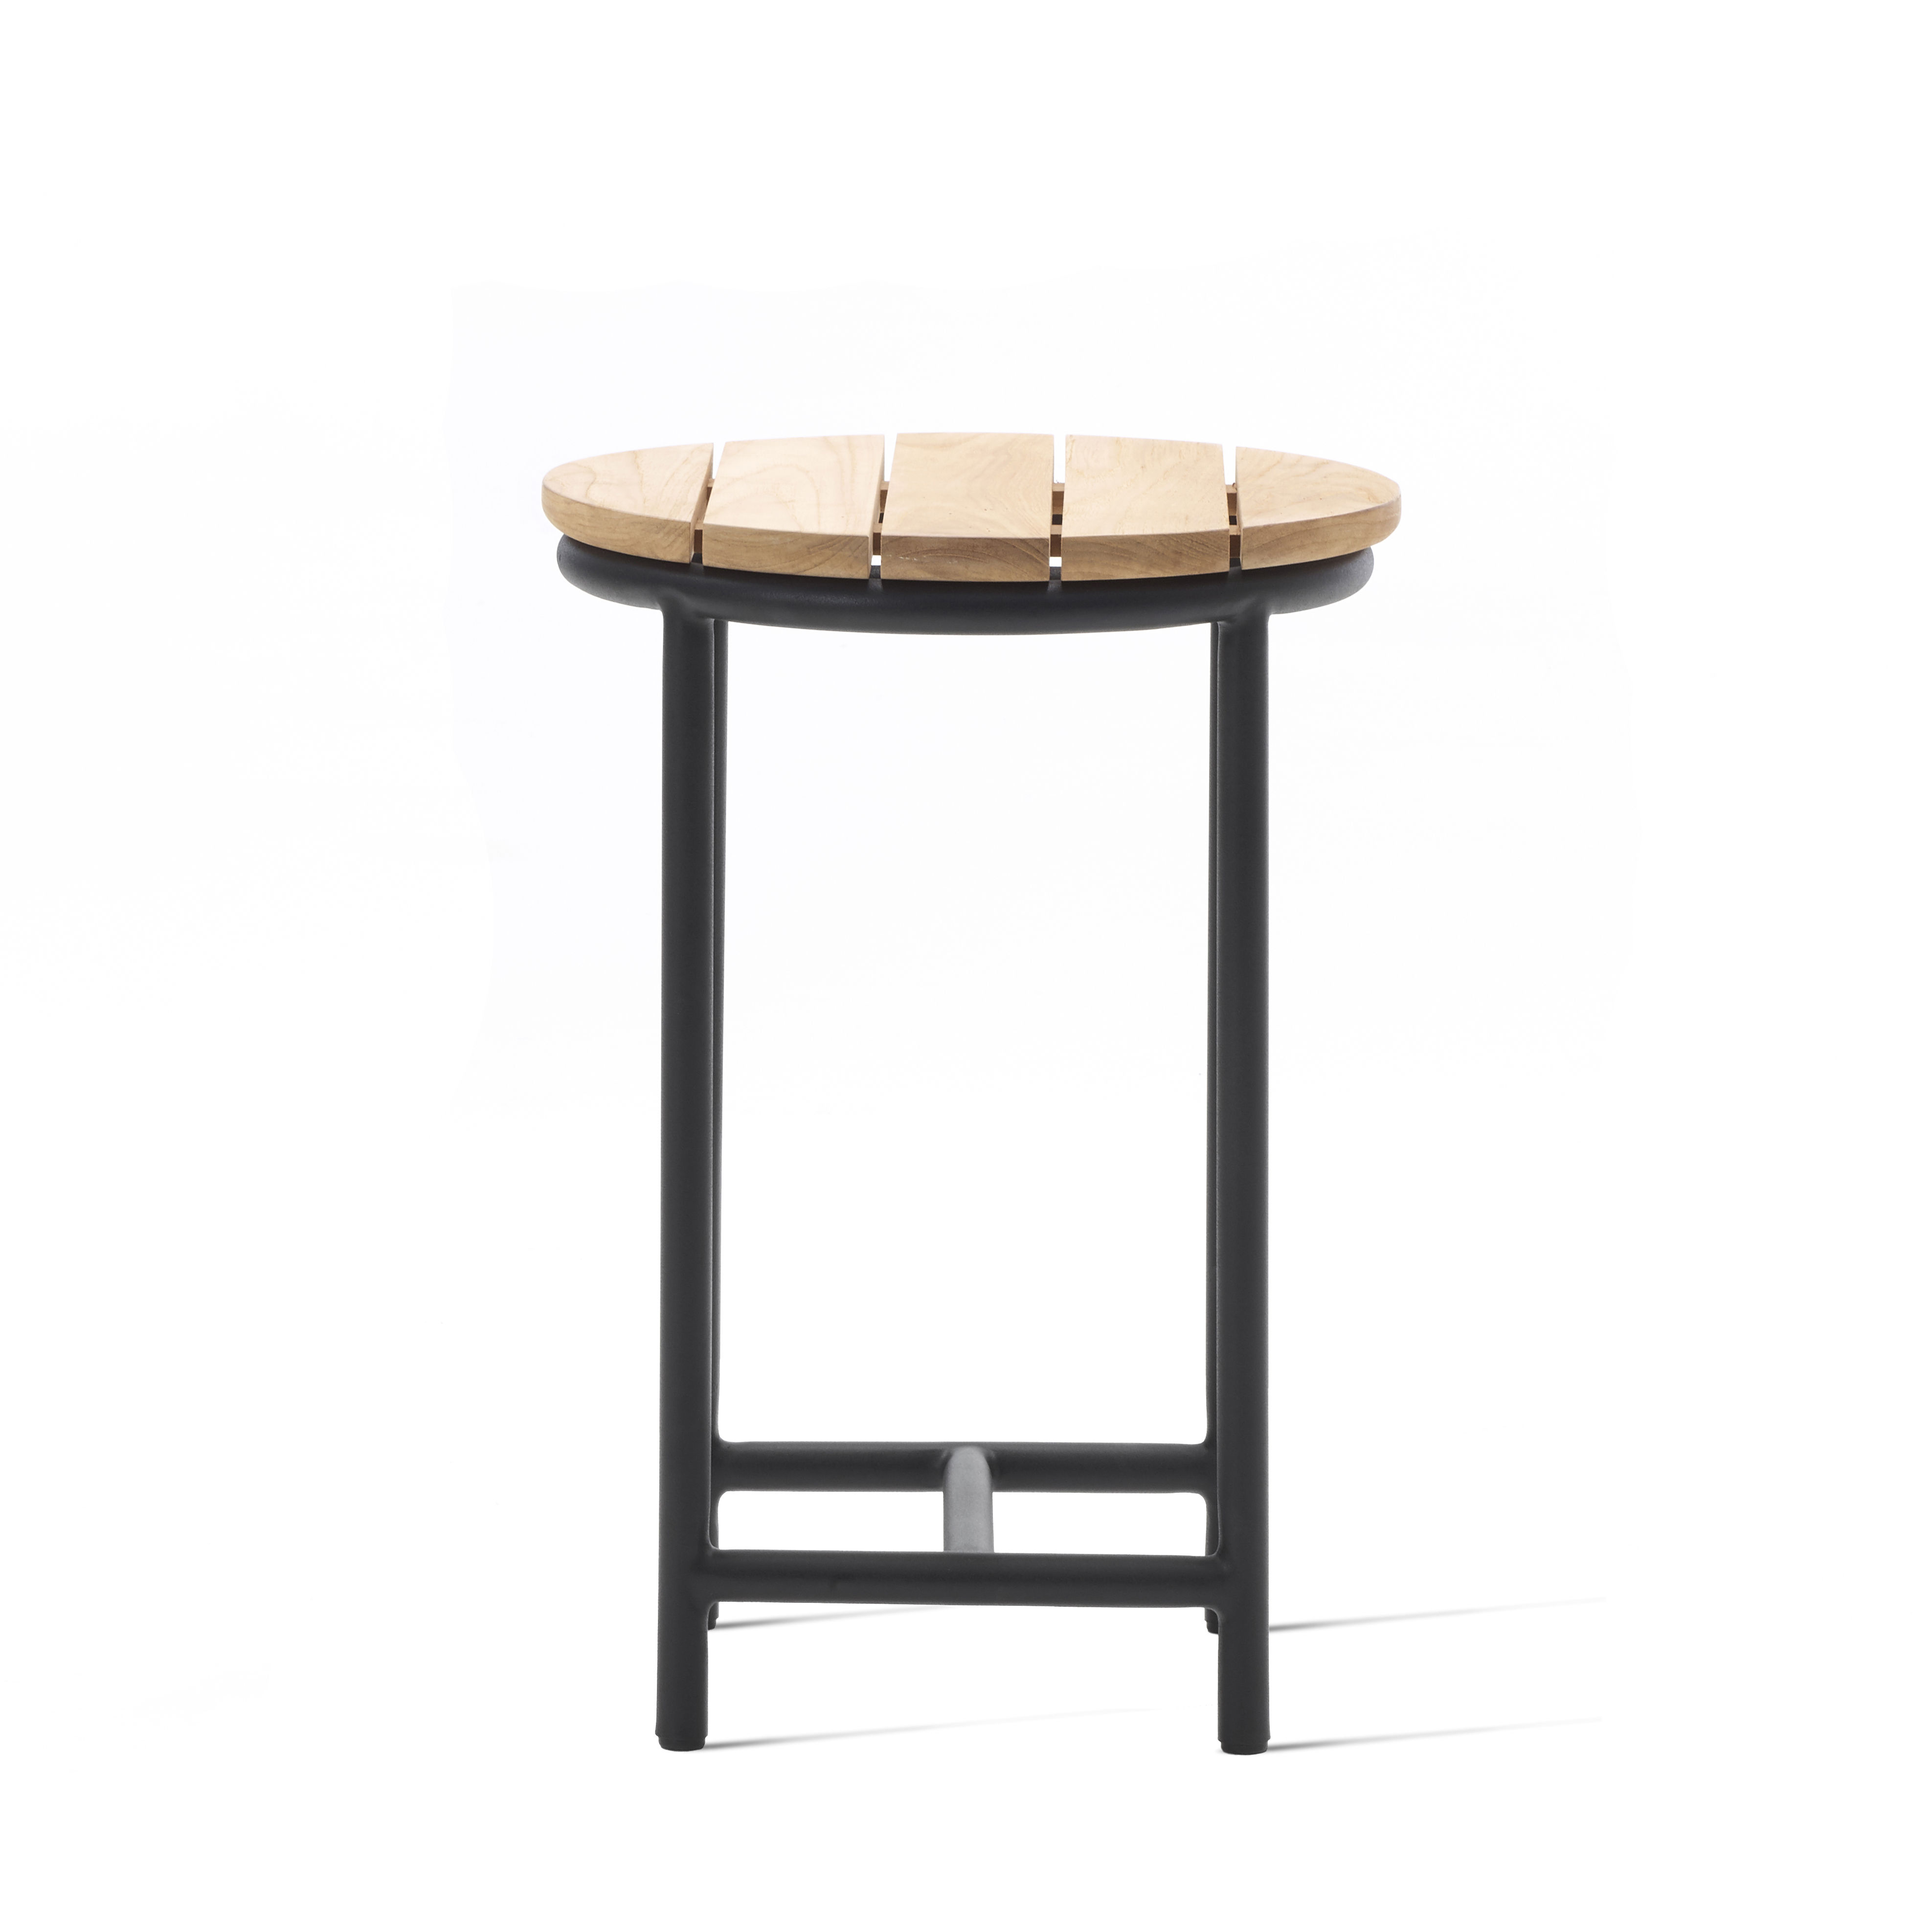 Mobilier - Tables basses - Table d'appoint Wicked / Ø 37 cm - Teck - Vincent Sheppard - Teck / Noir - Aluminium thermolaqué, Teck massif